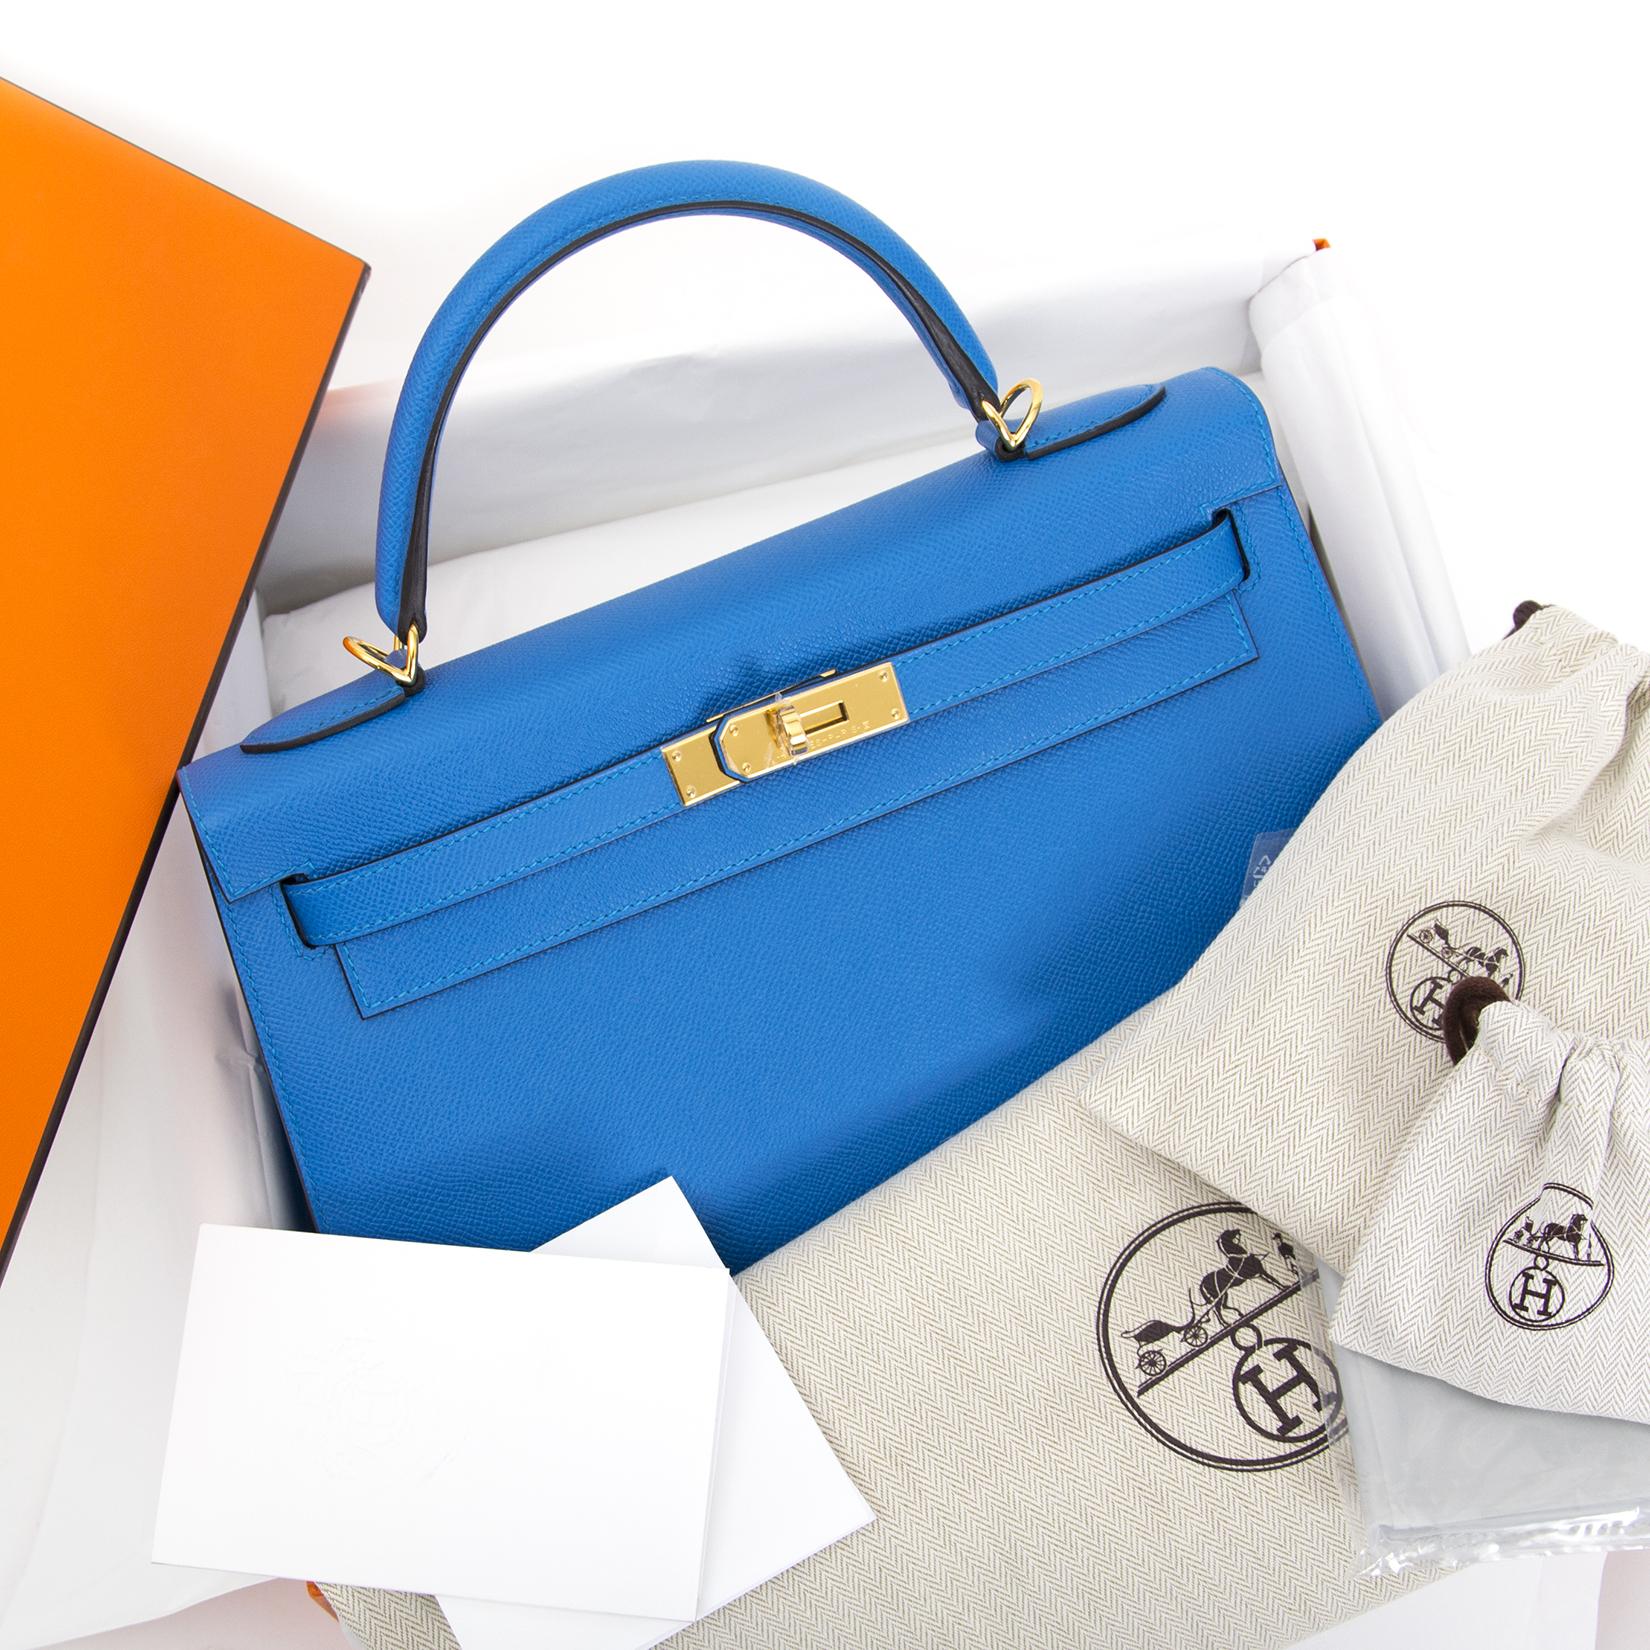 Hermès Kelly 32 Blue Zanzibar Epsom GHW for sale online at Labellov